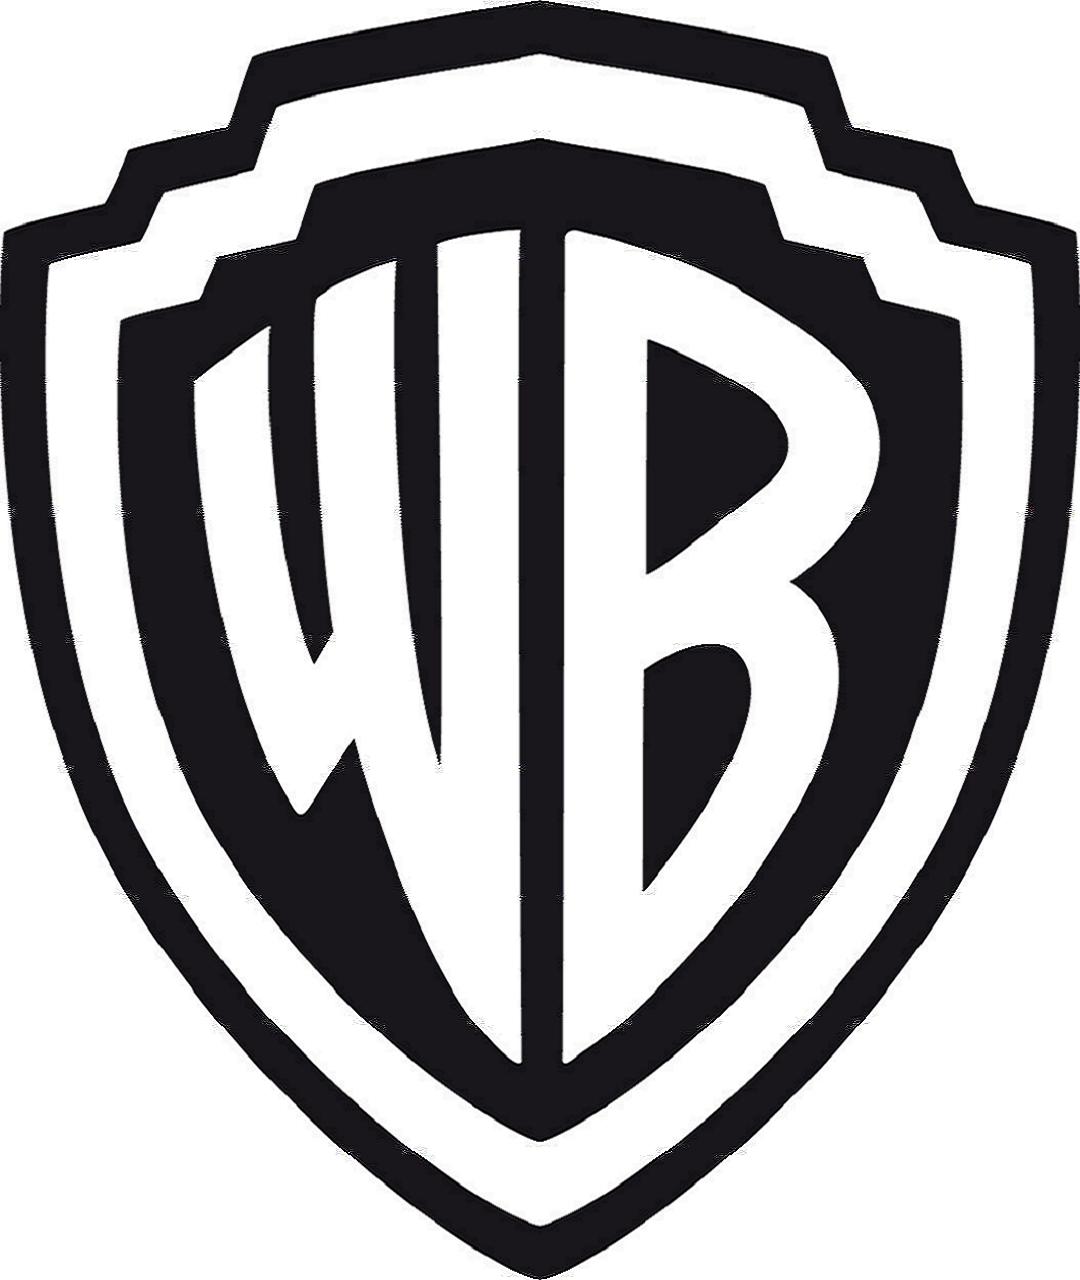 . Hdpng.com Manthemovieguy Daqsiot.png Warner Bros Logo Hdpng.com  - Warner Bros, Transparent background PNG HD thumbnail